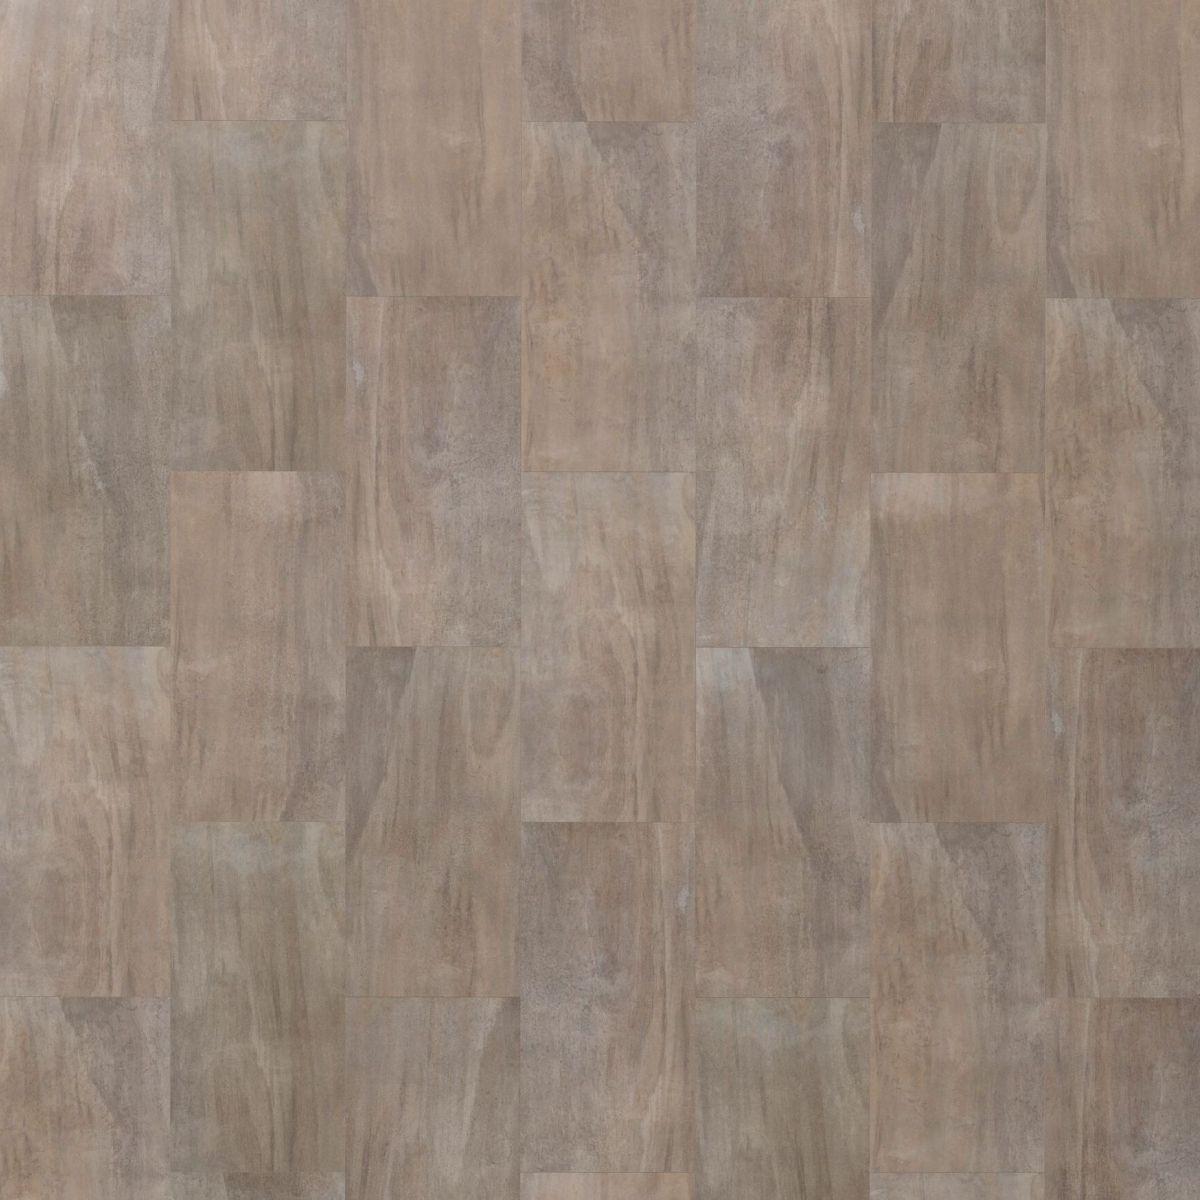 Avatara vloeren steen O8 plan